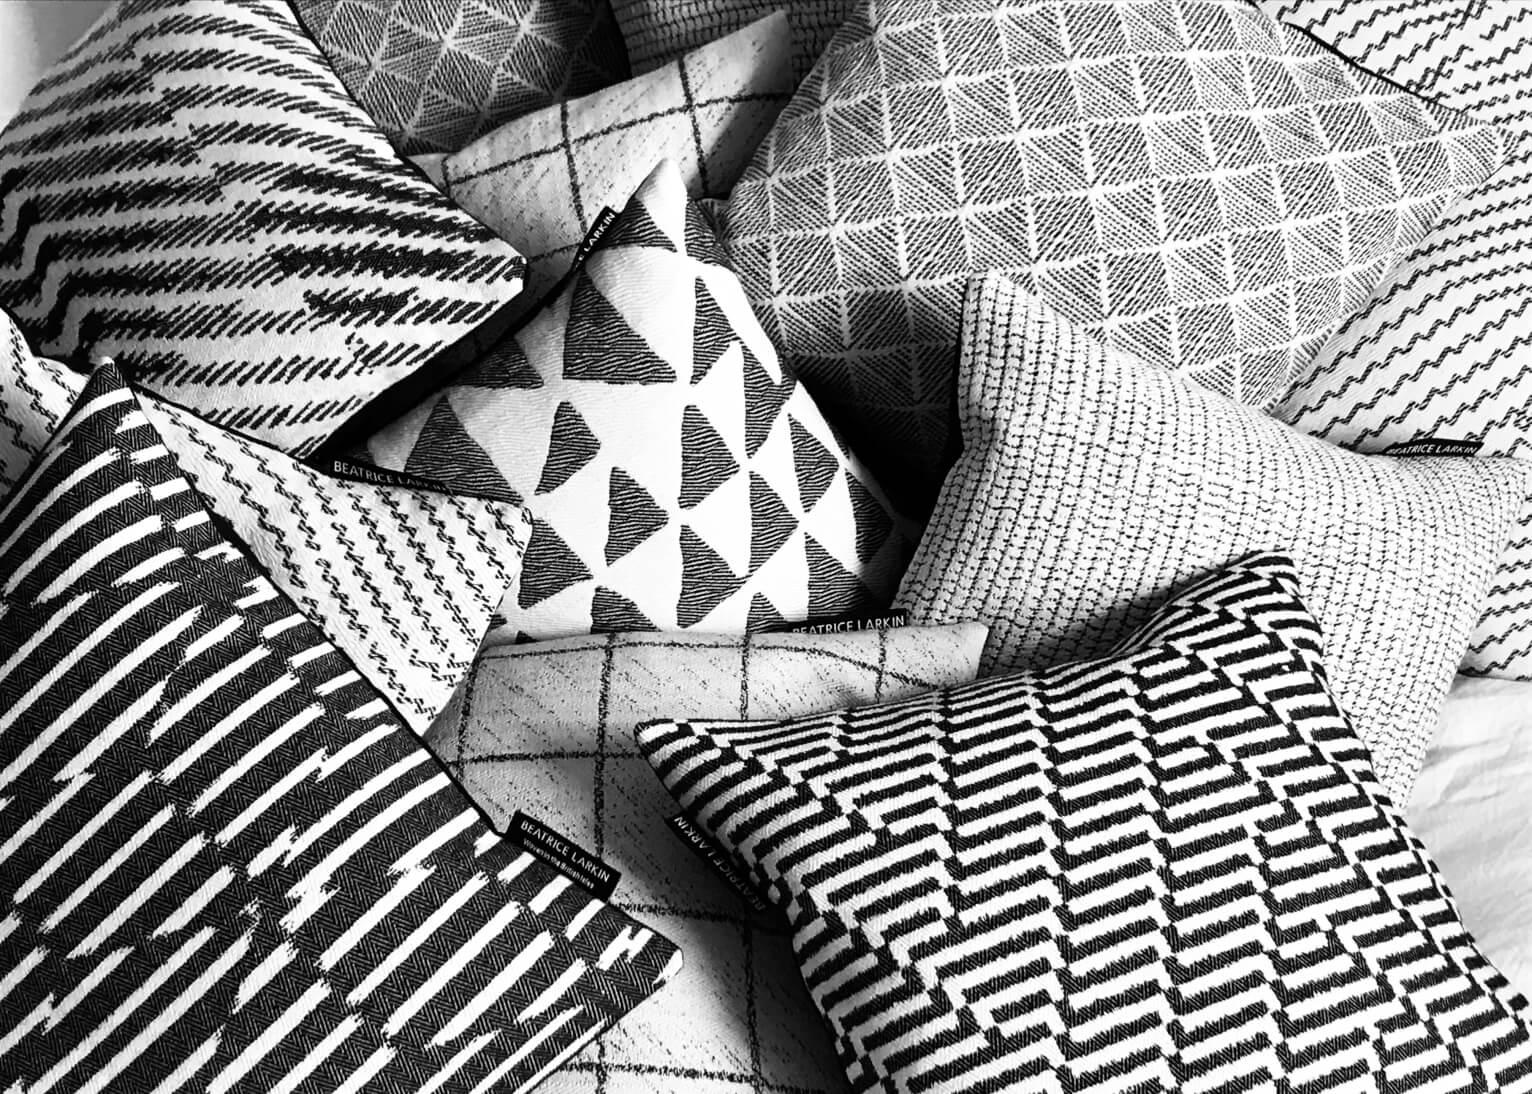 Beatrice Larkin Assortment of Monochrome Cushions in Bold Geometric Patterns